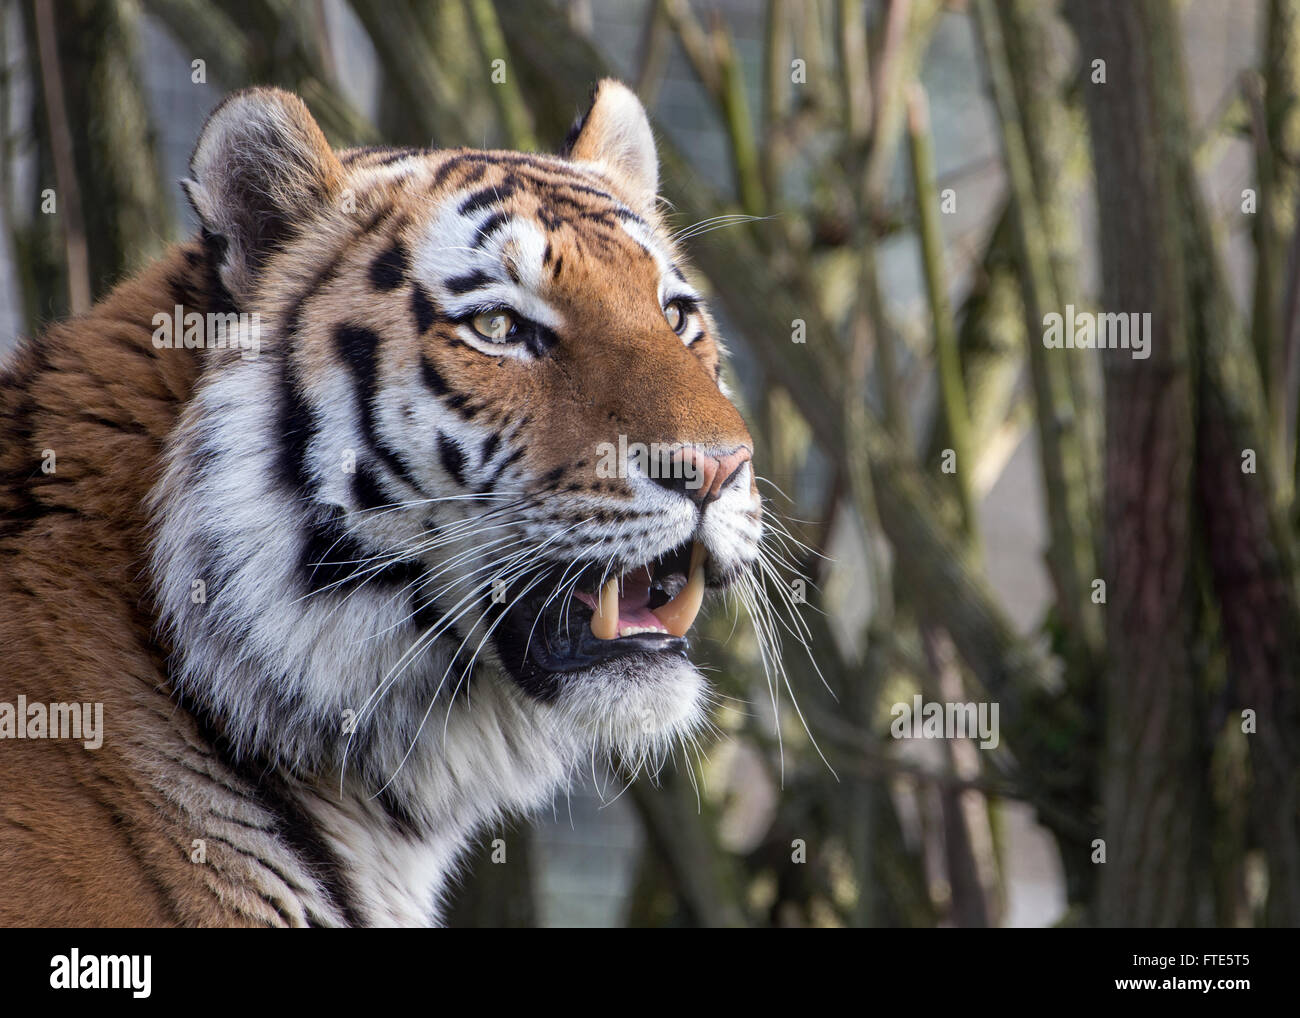 Macho (Amur) tigre siberiano Imagen De Stock